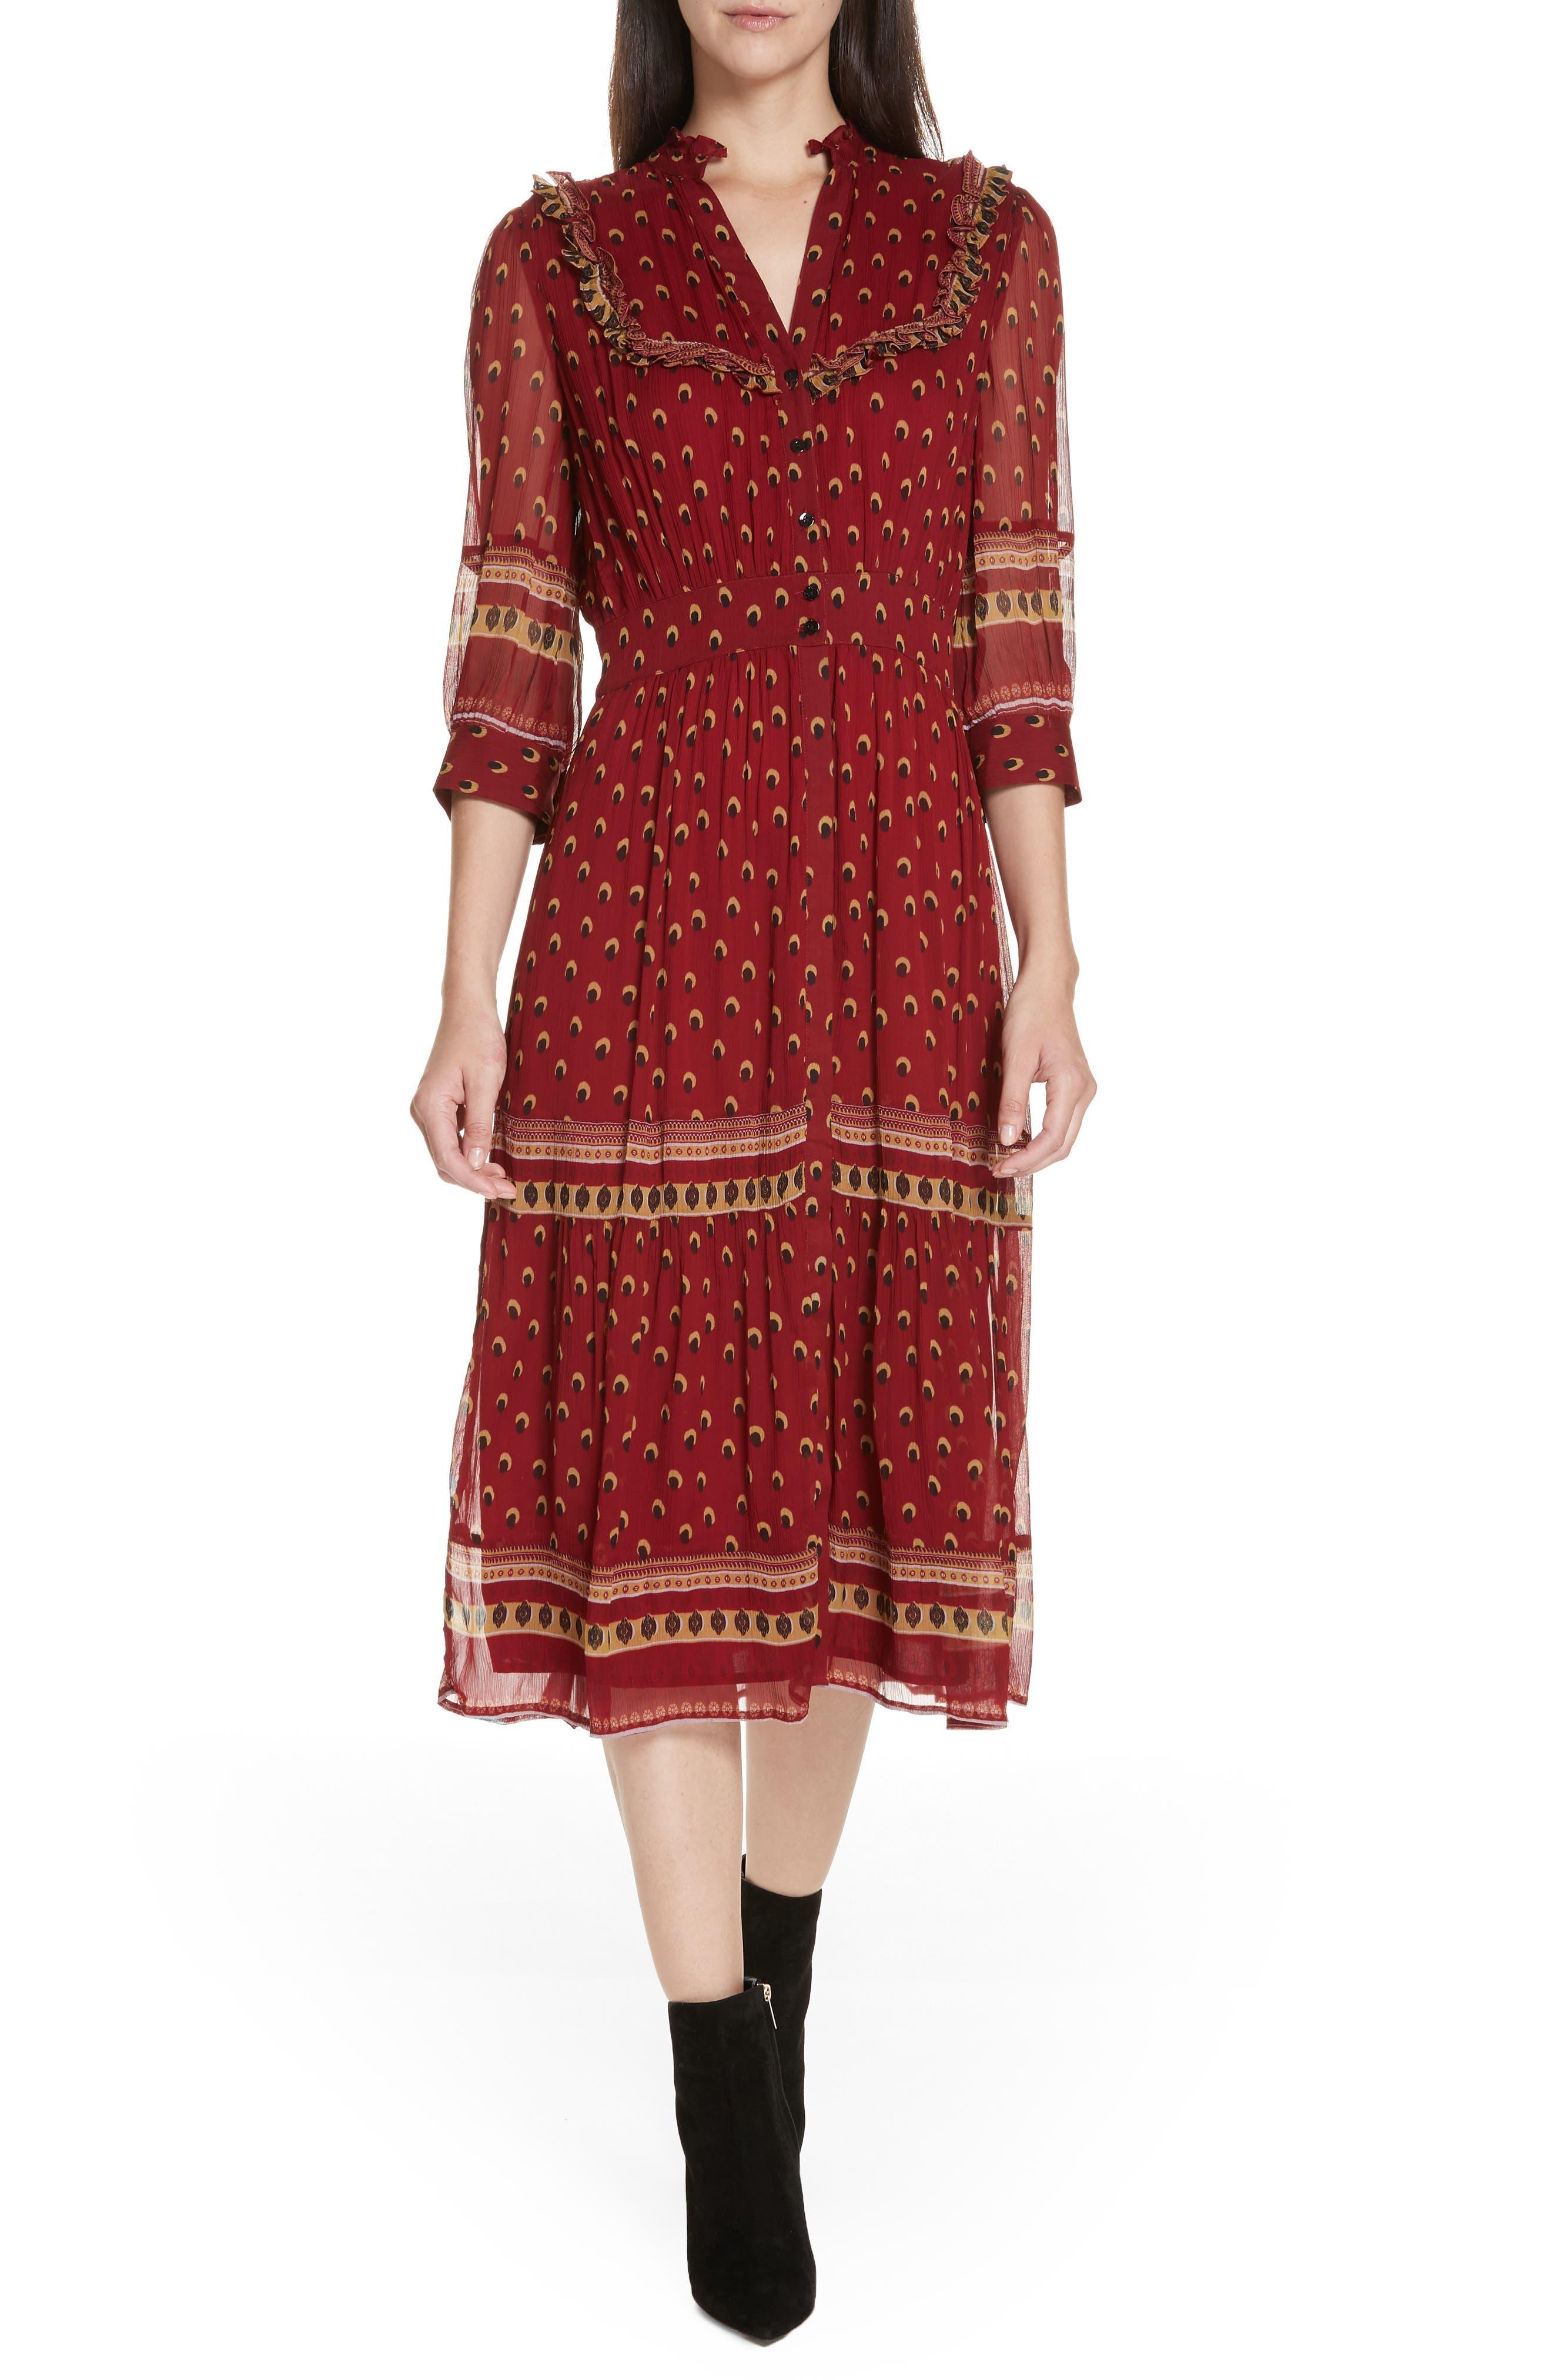 70s Dresses – Disco Dresses, Hippie Dresses, Wrap Dresses Womens Ba  sh Barie Ruffle Print Midi Dress Size Large - Red $260.98 AT vintagedancer.com